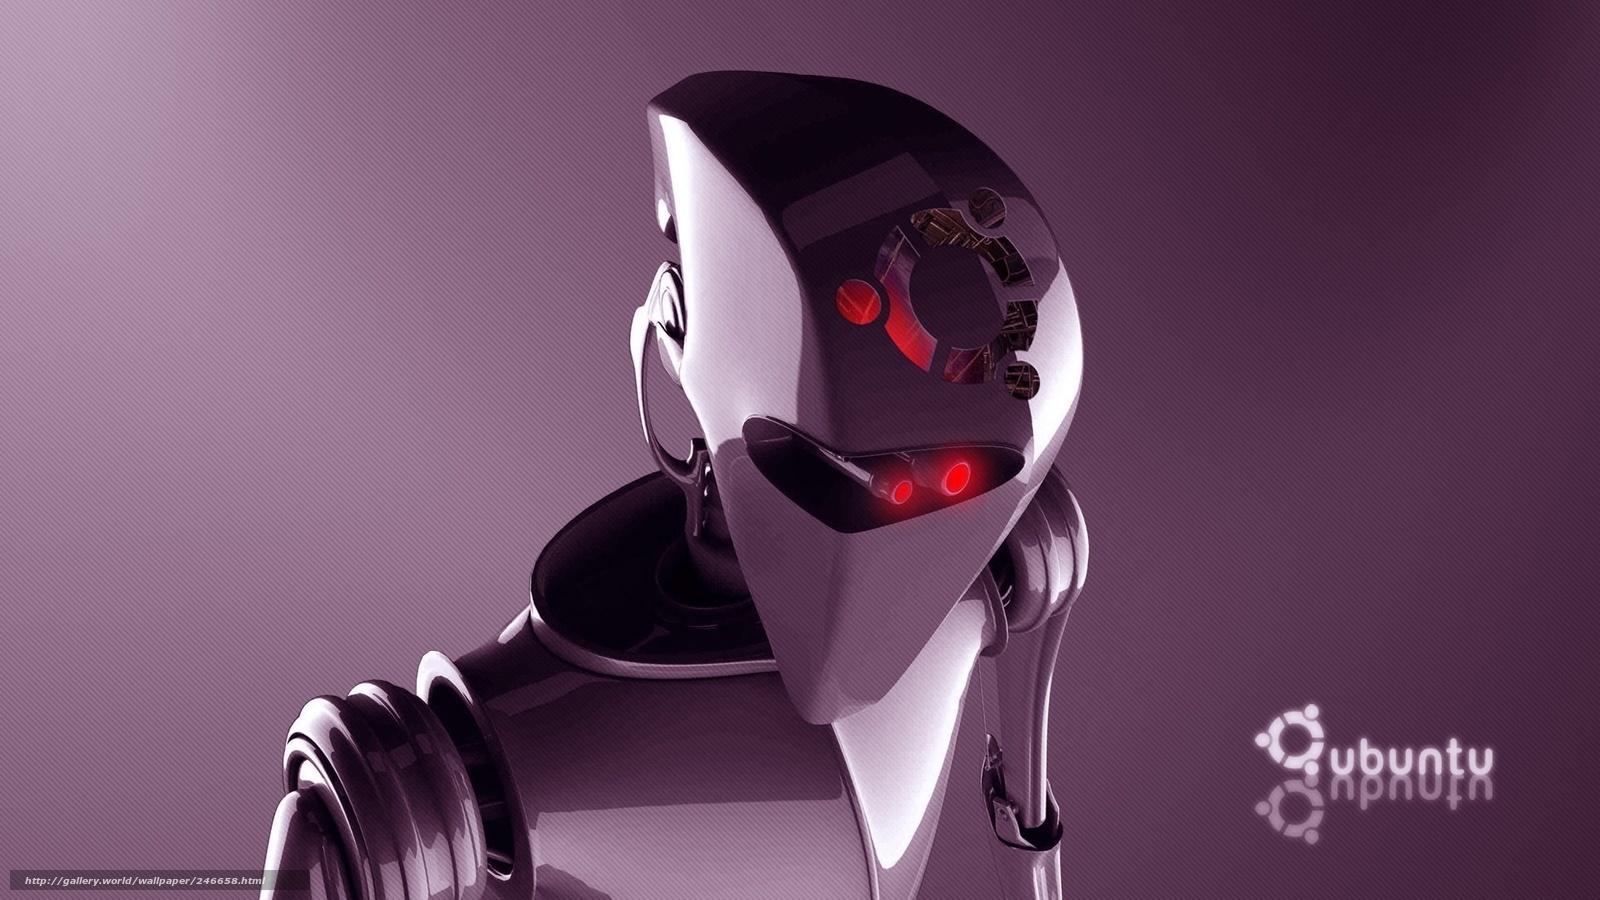 Tlcharger fond d 39 ecran ordinateur linux ubuntu robot for Photo ecran ubuntu